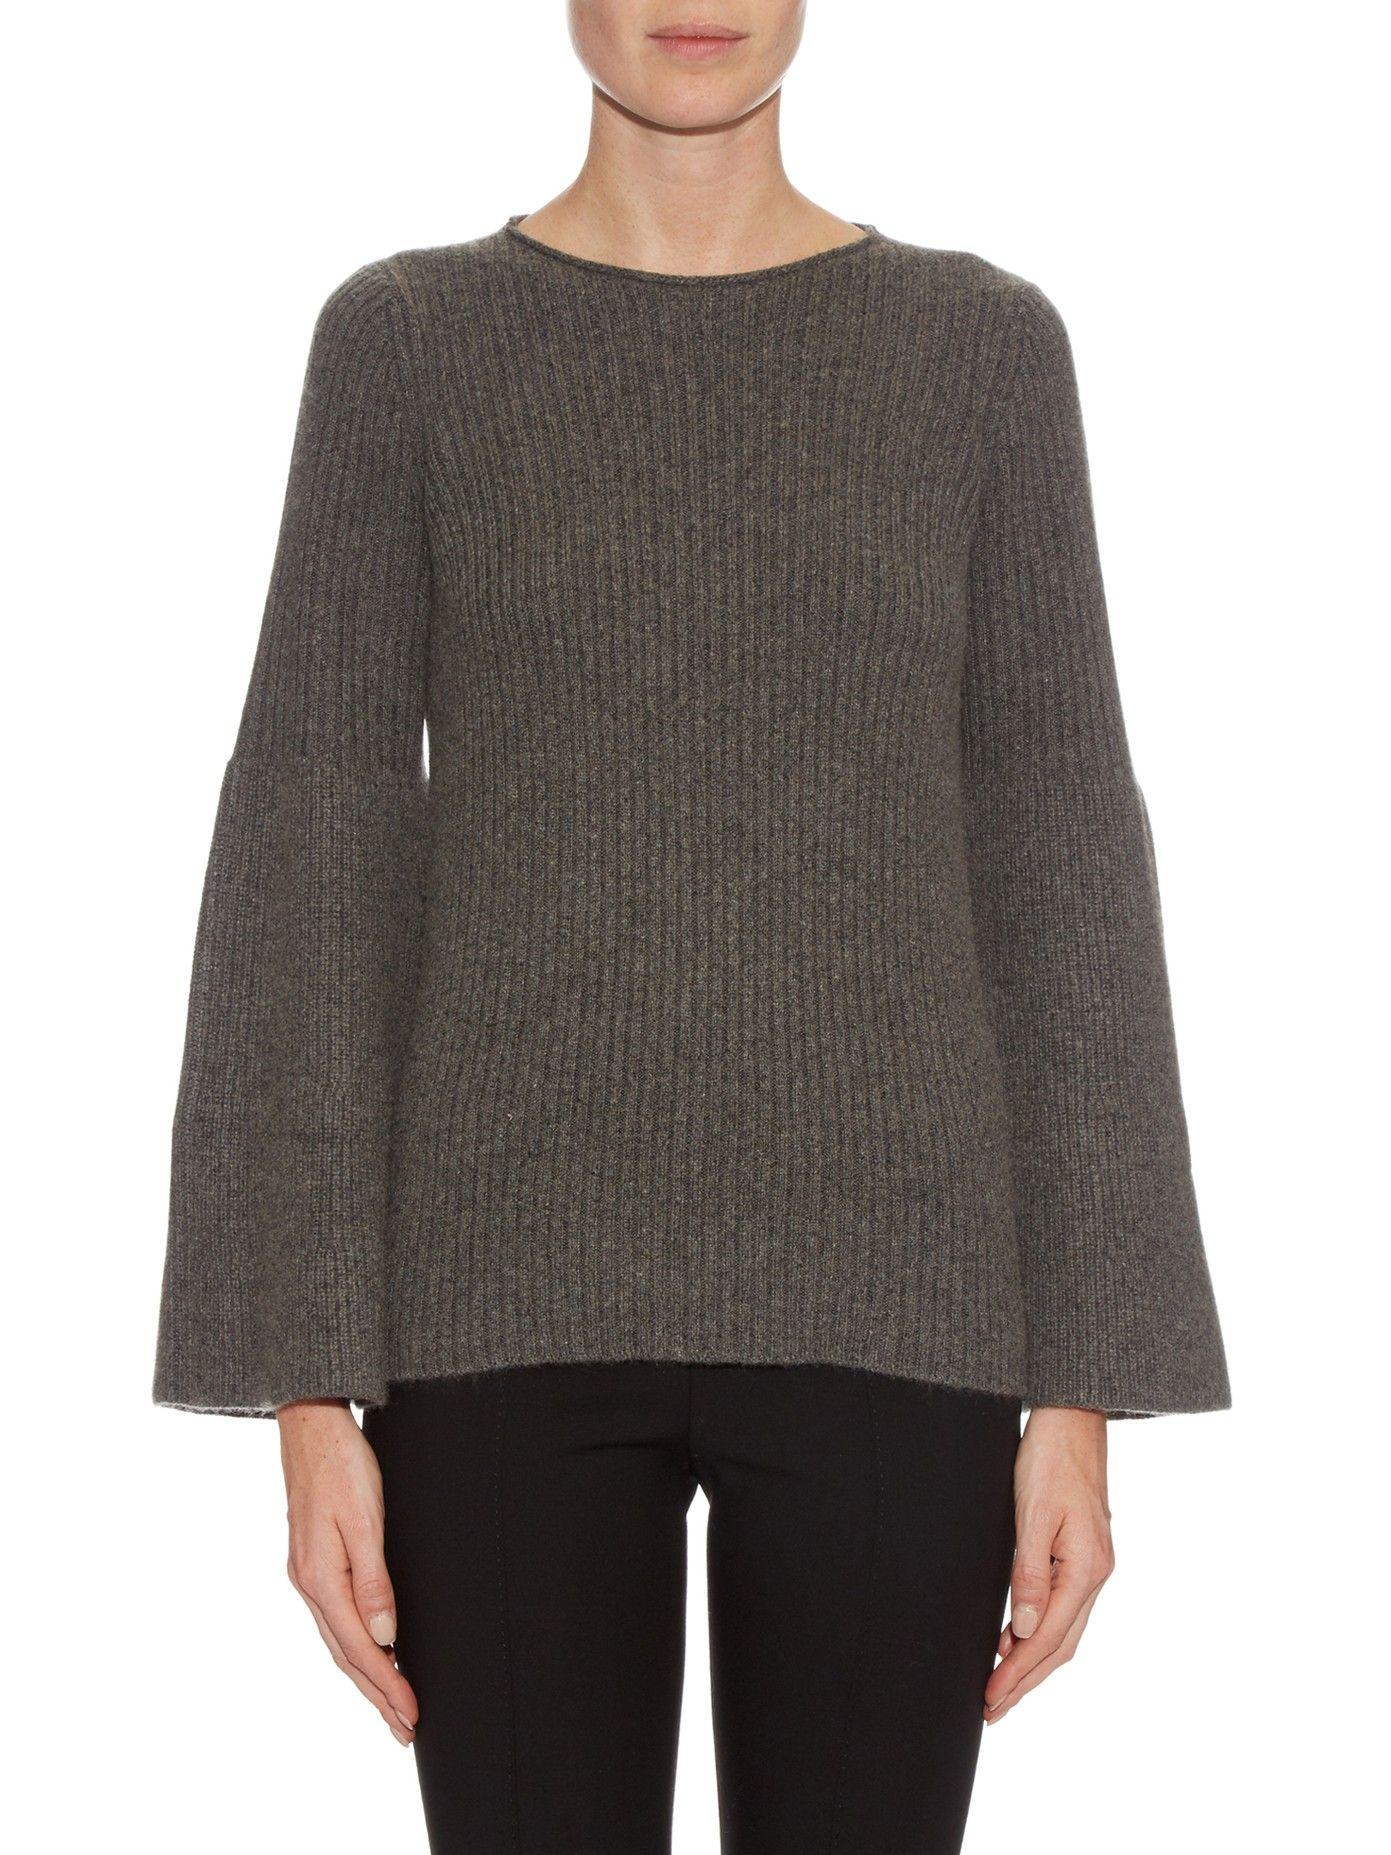 Atilia cashmere flared-sleeve sweater   The Row   MATCHESFASHION.COM